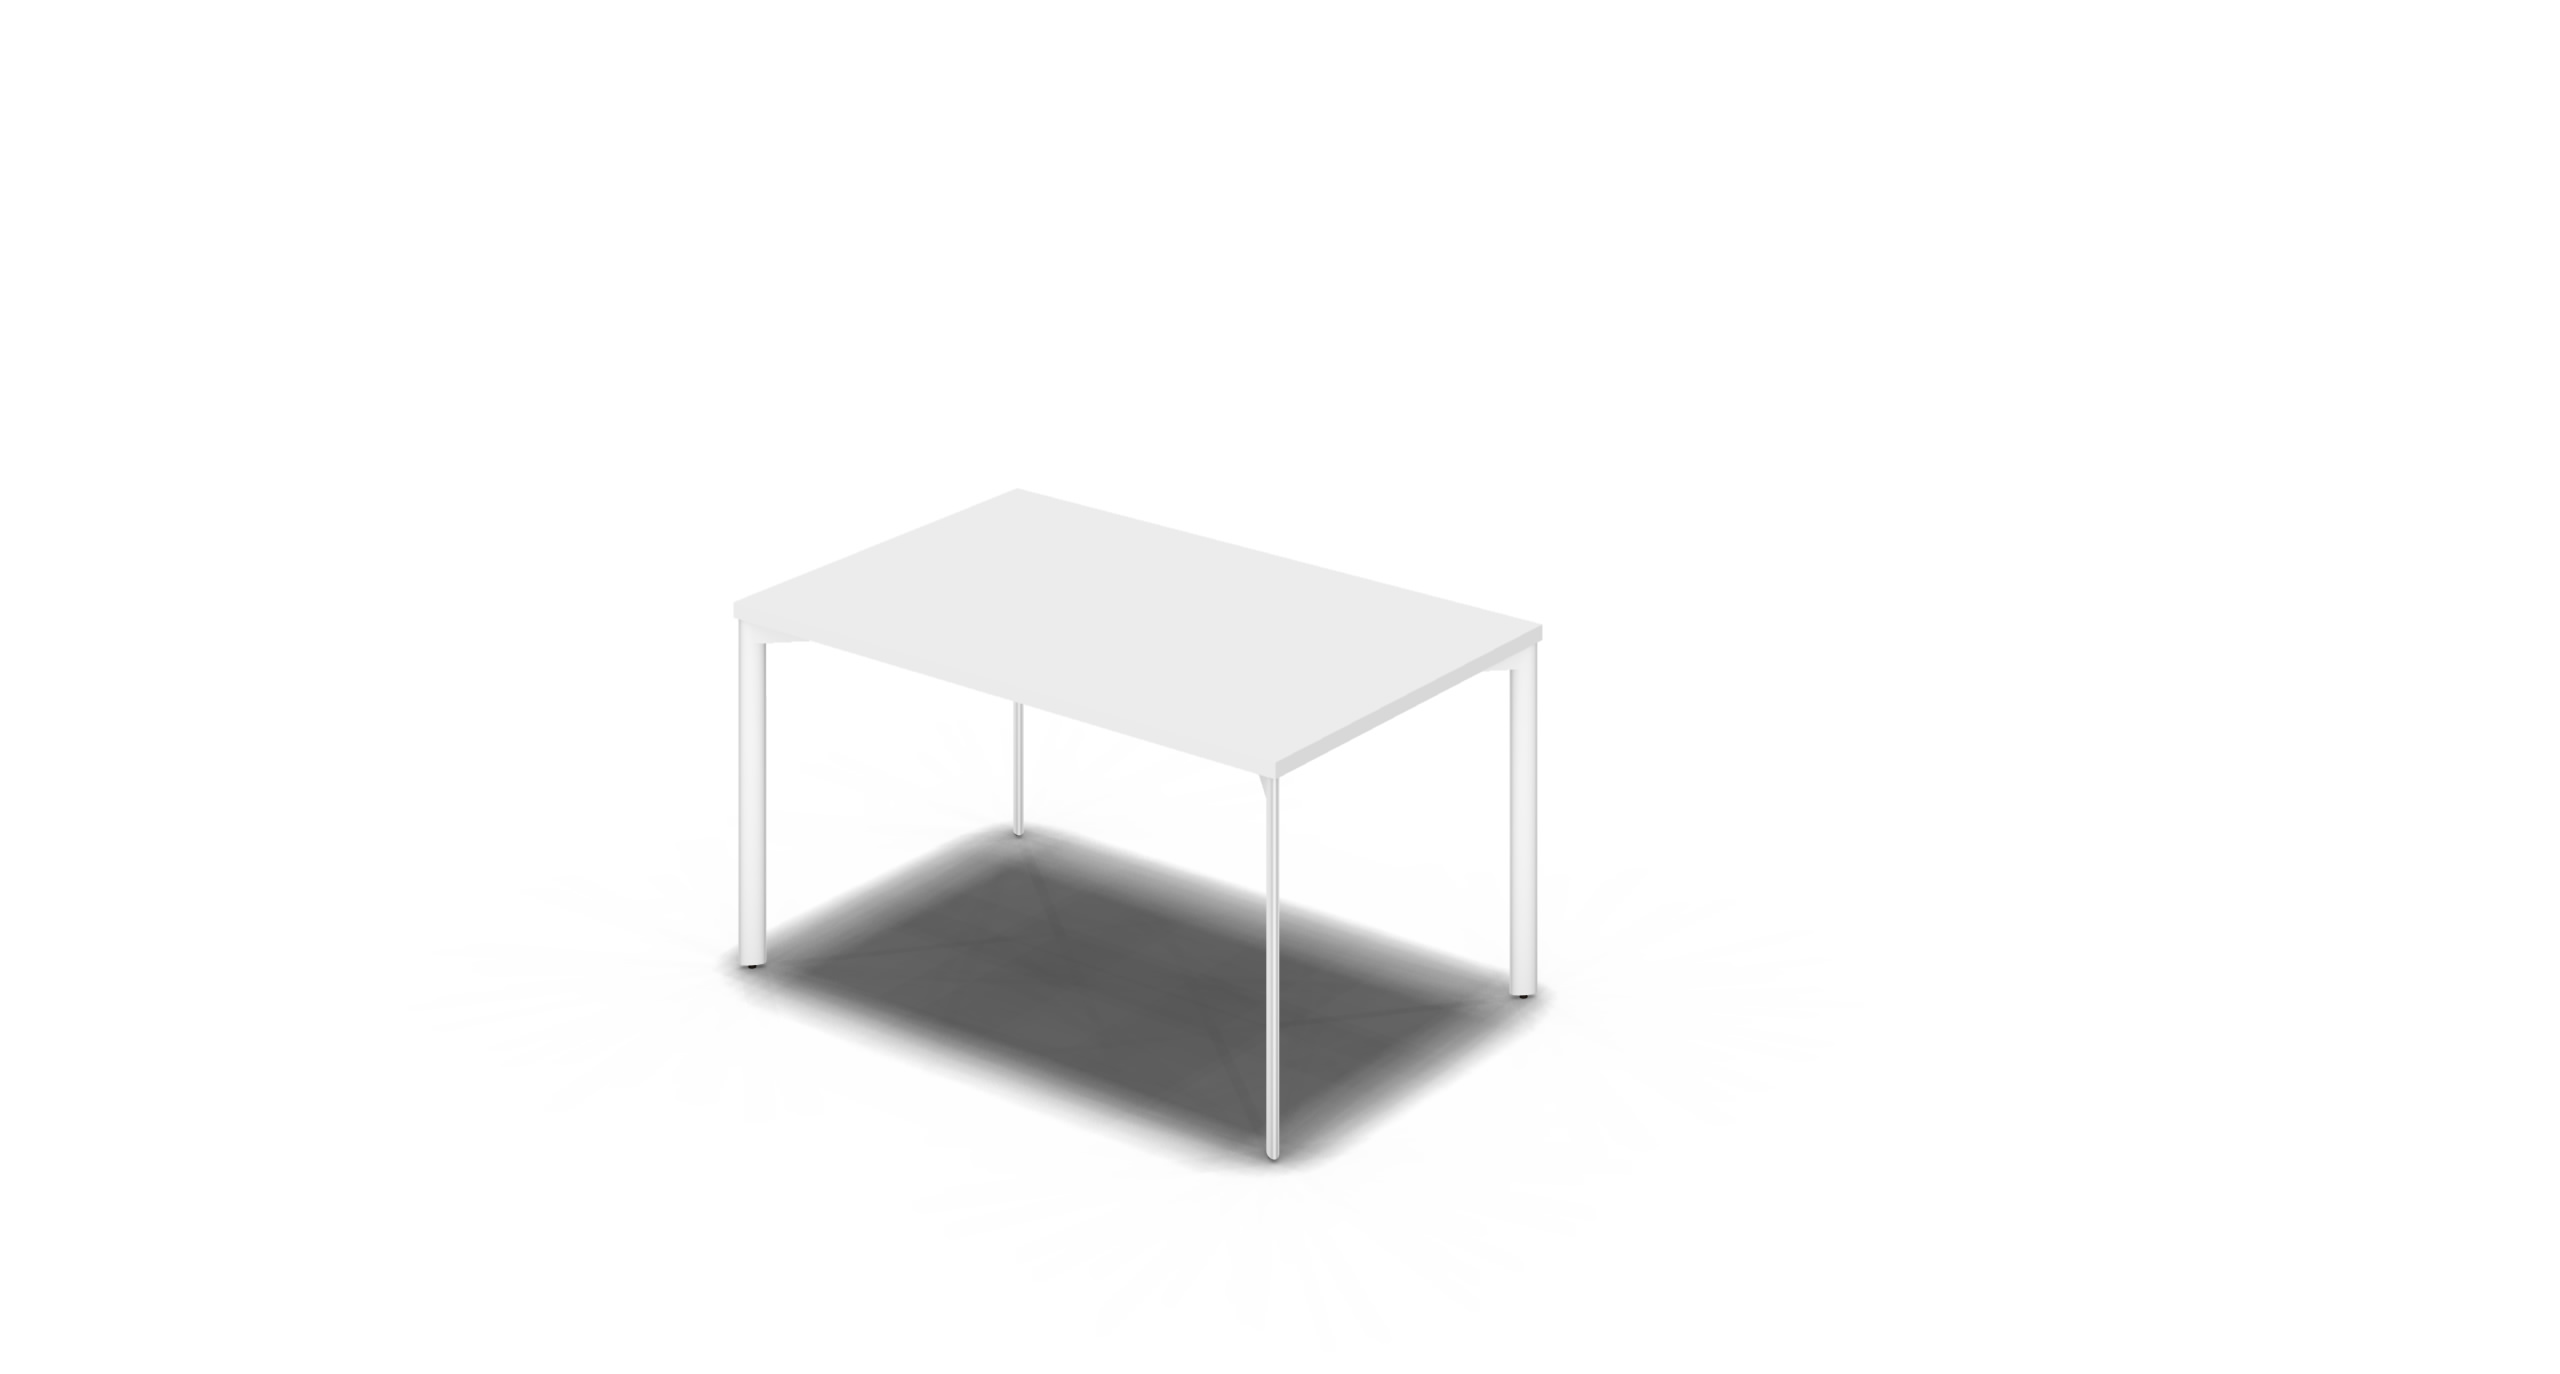 Table_Slim_1200x750_White_White_noOption